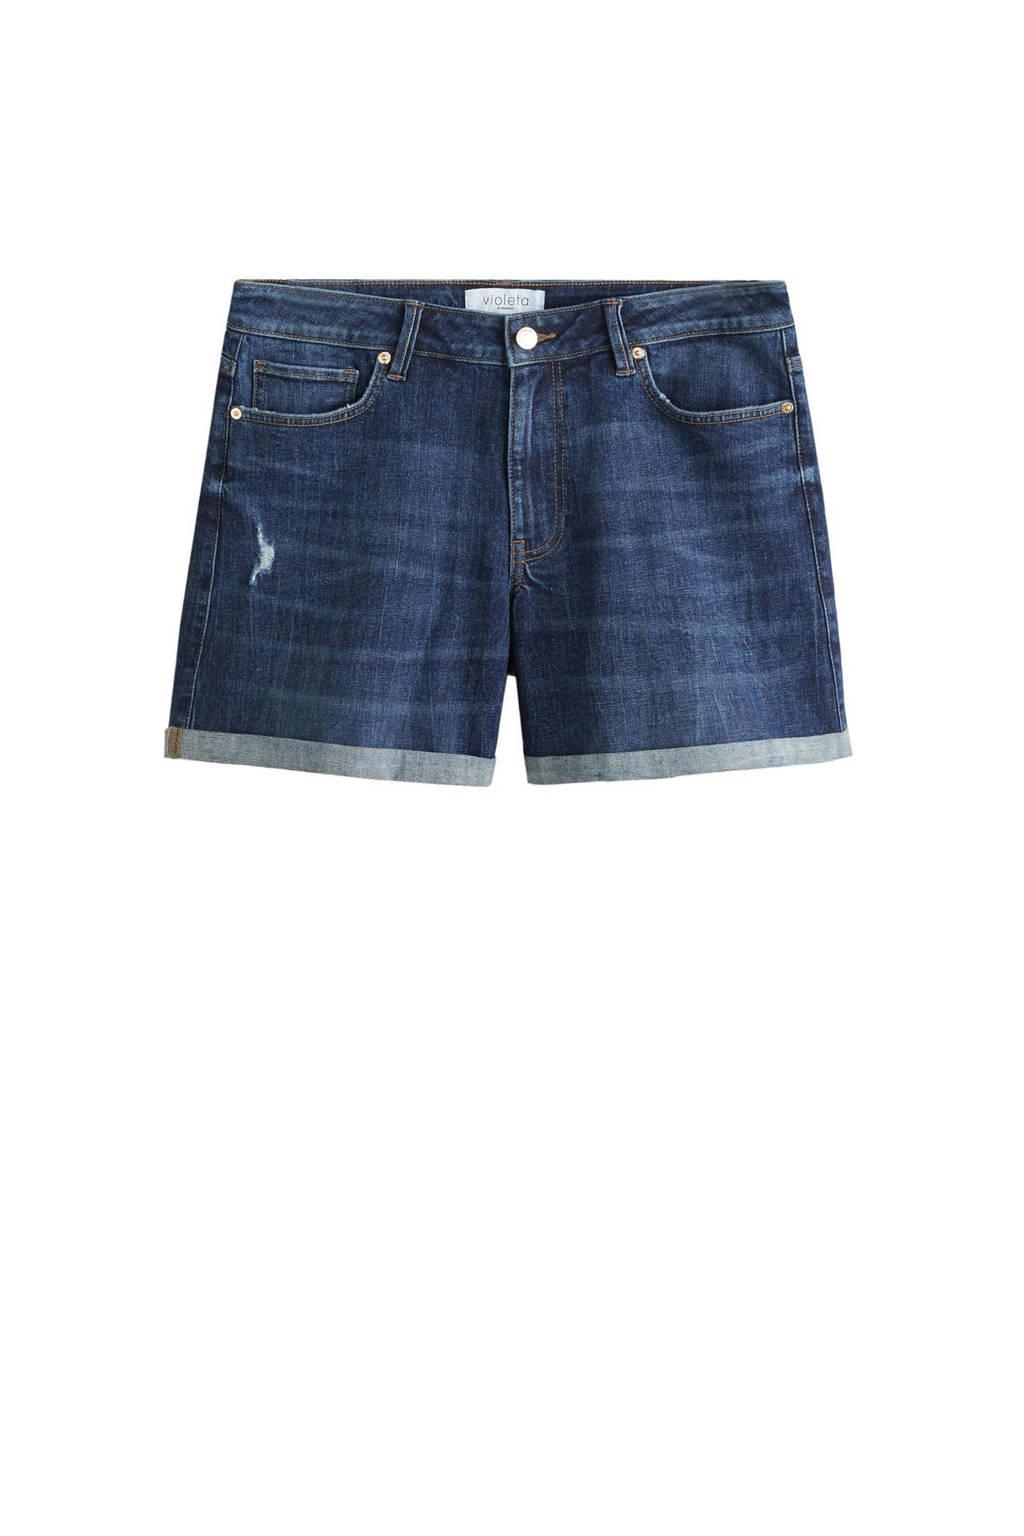 Violeta by Mango jeans short, Donkerblauw